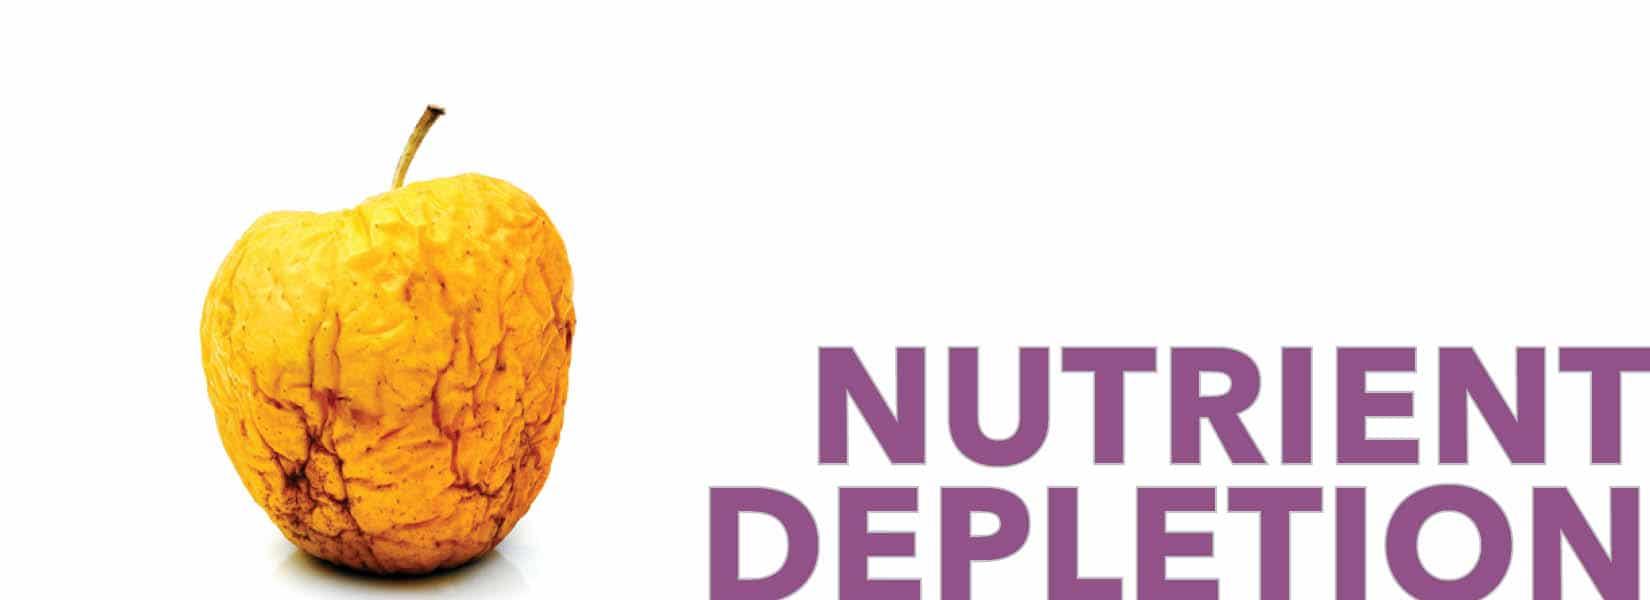 Fusion Pharmacy Nutrient Depletion